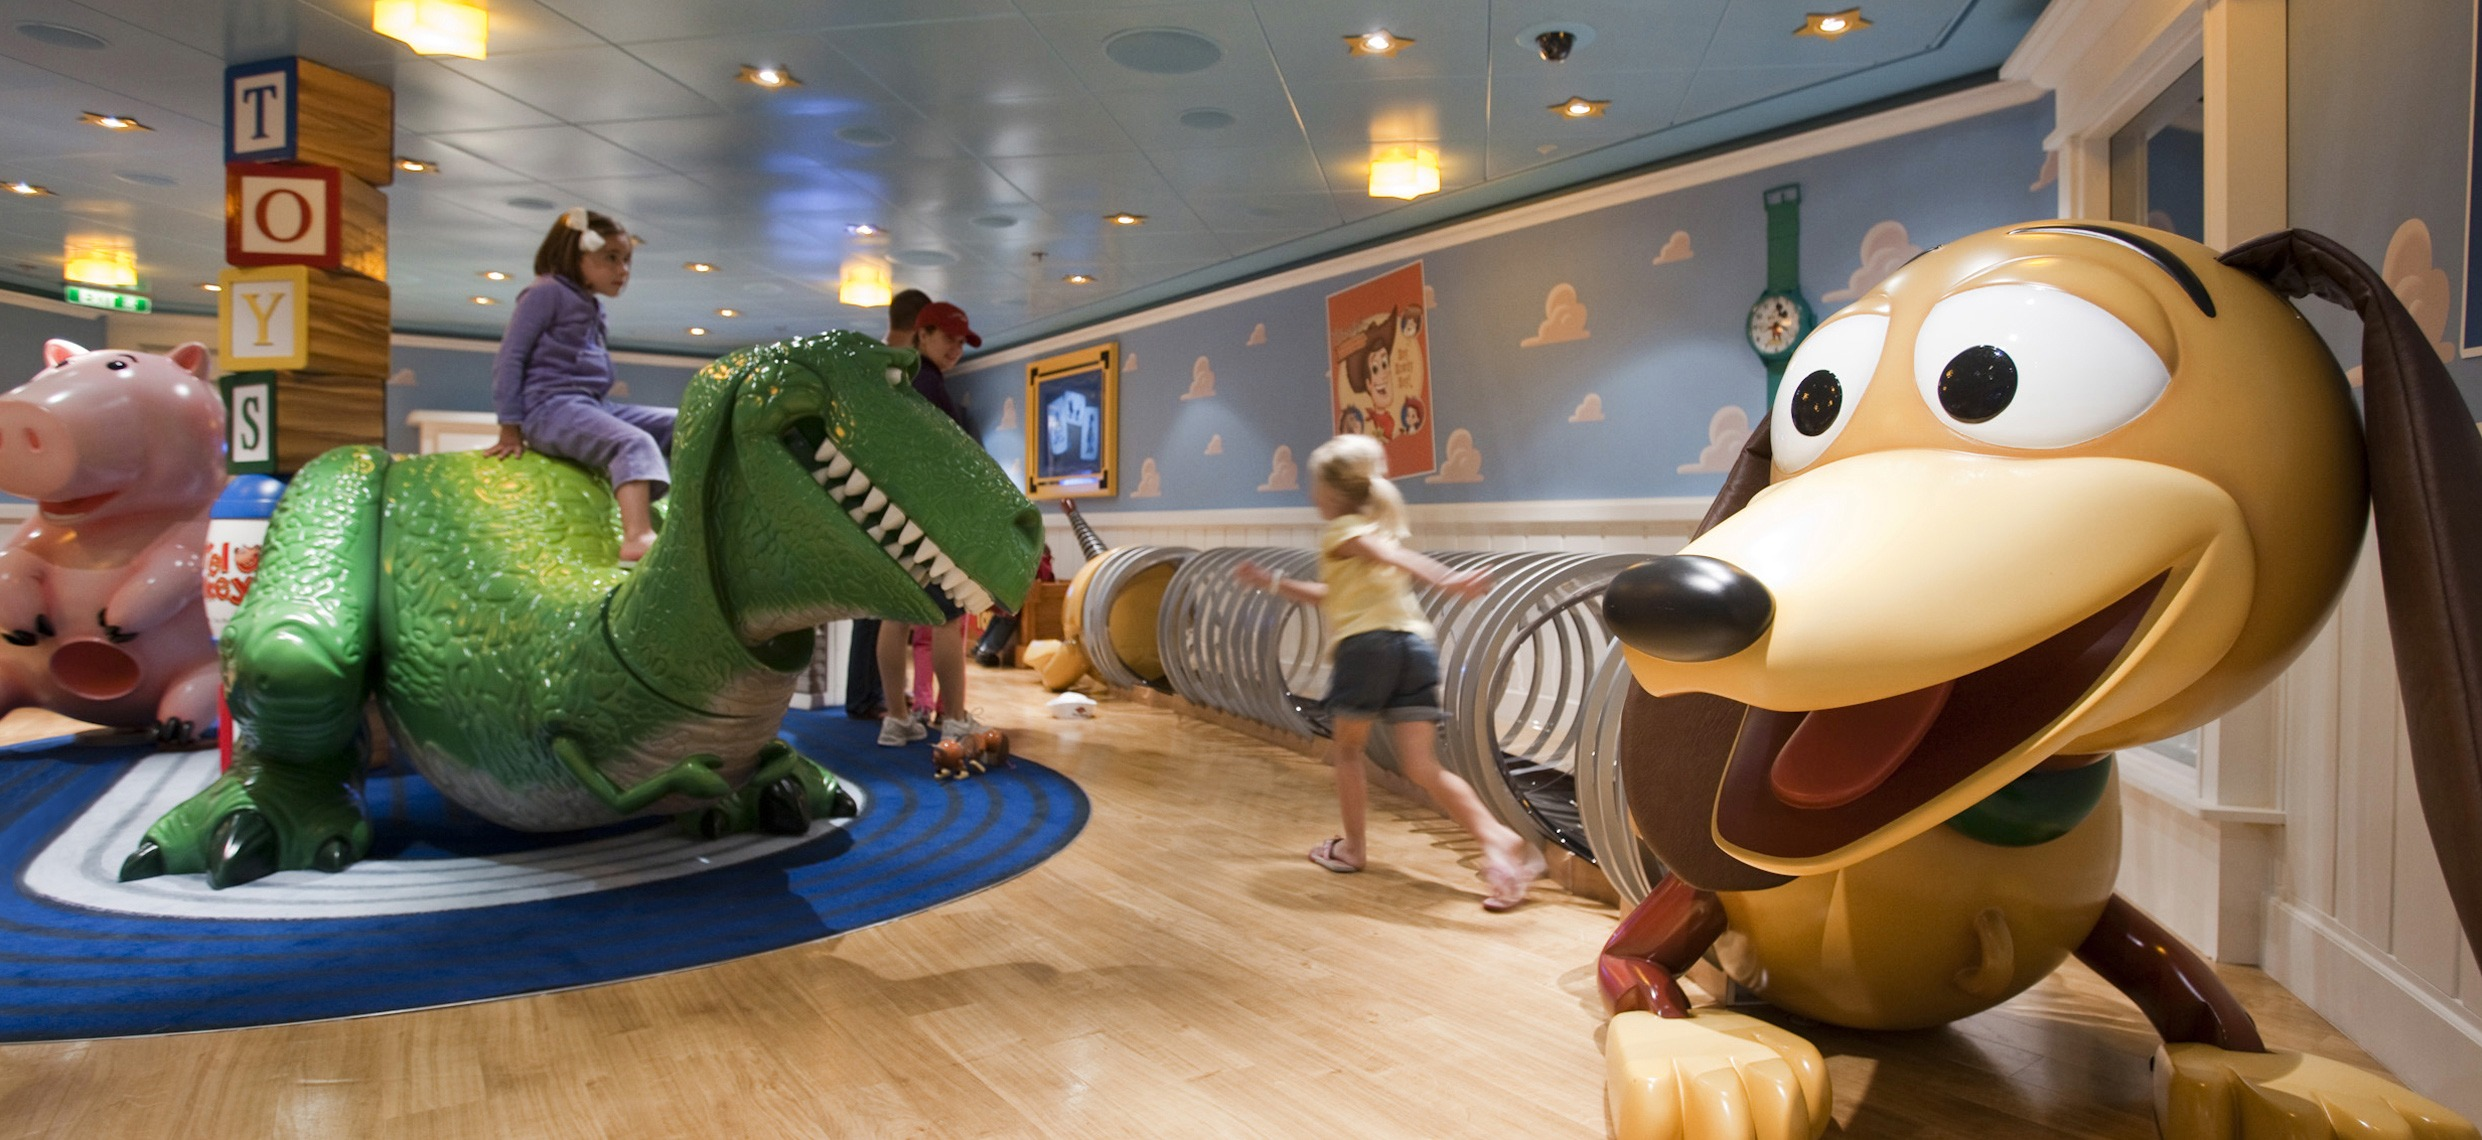 Disney Cruise Game Room